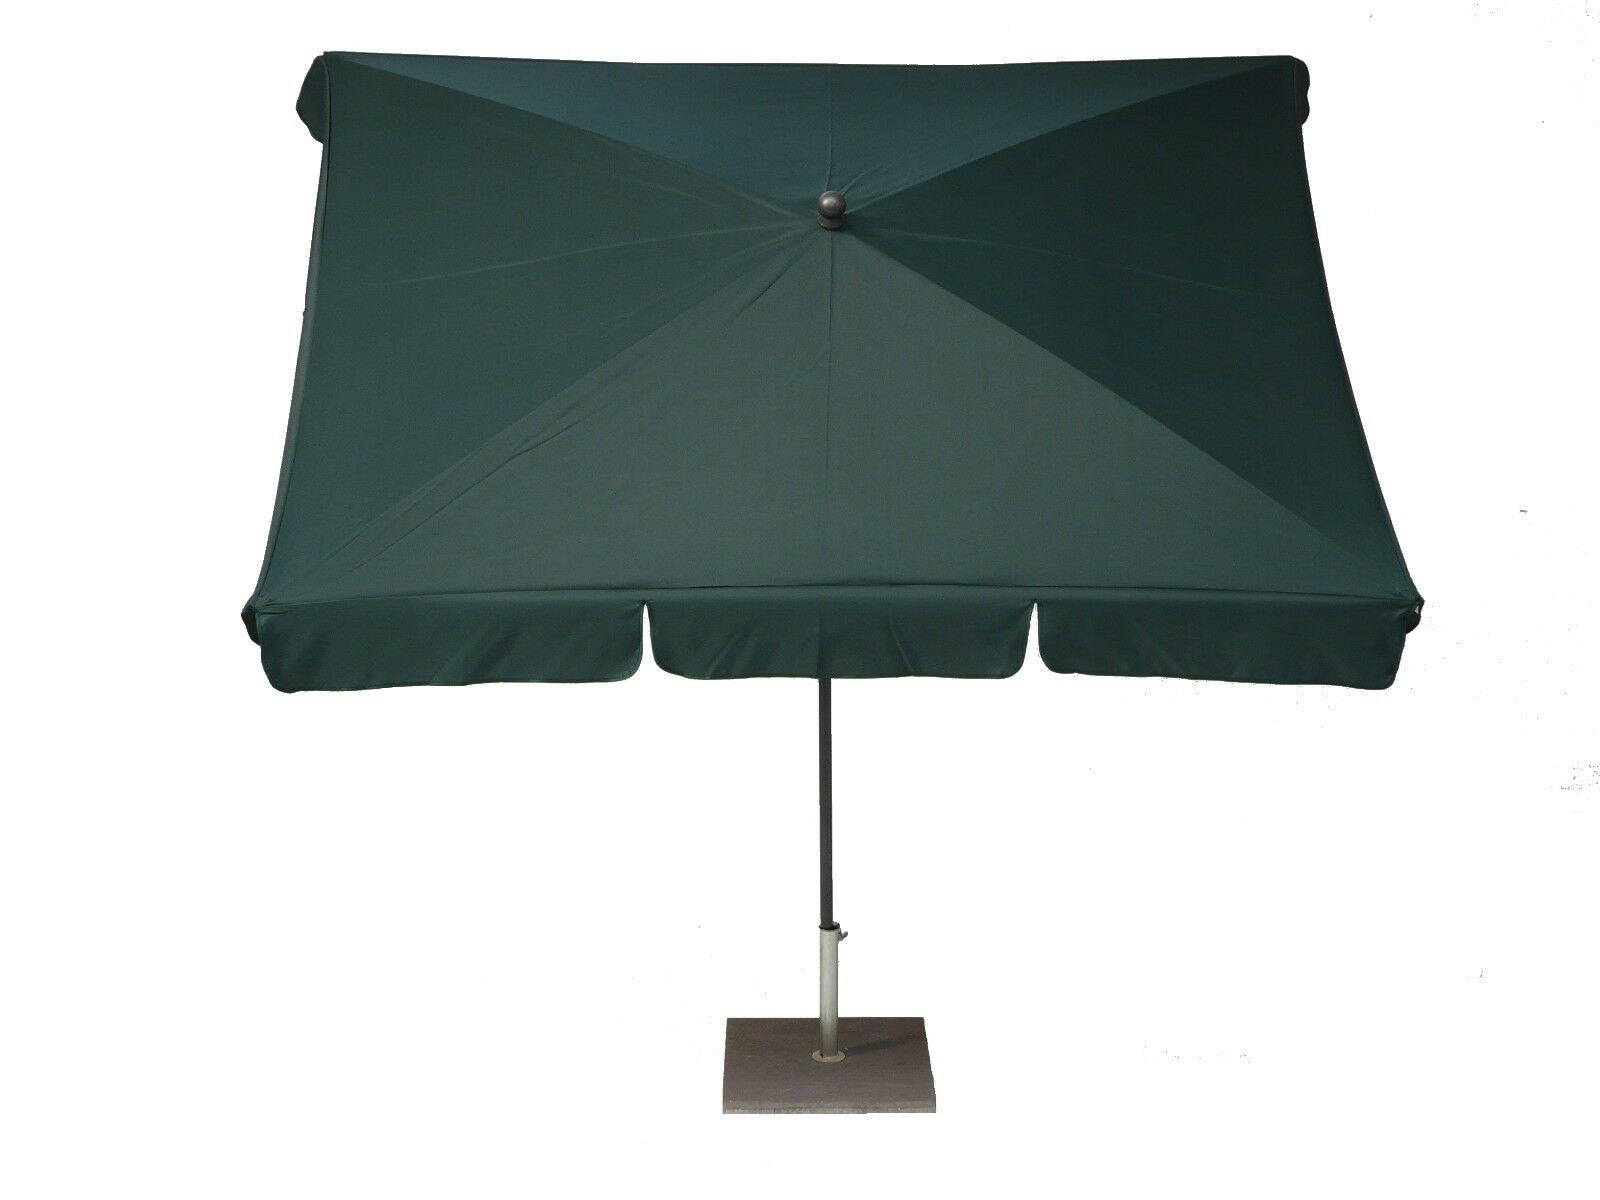 Maffei ombrellone palo centrale Novara Art.115R verde 240x150 cm made in